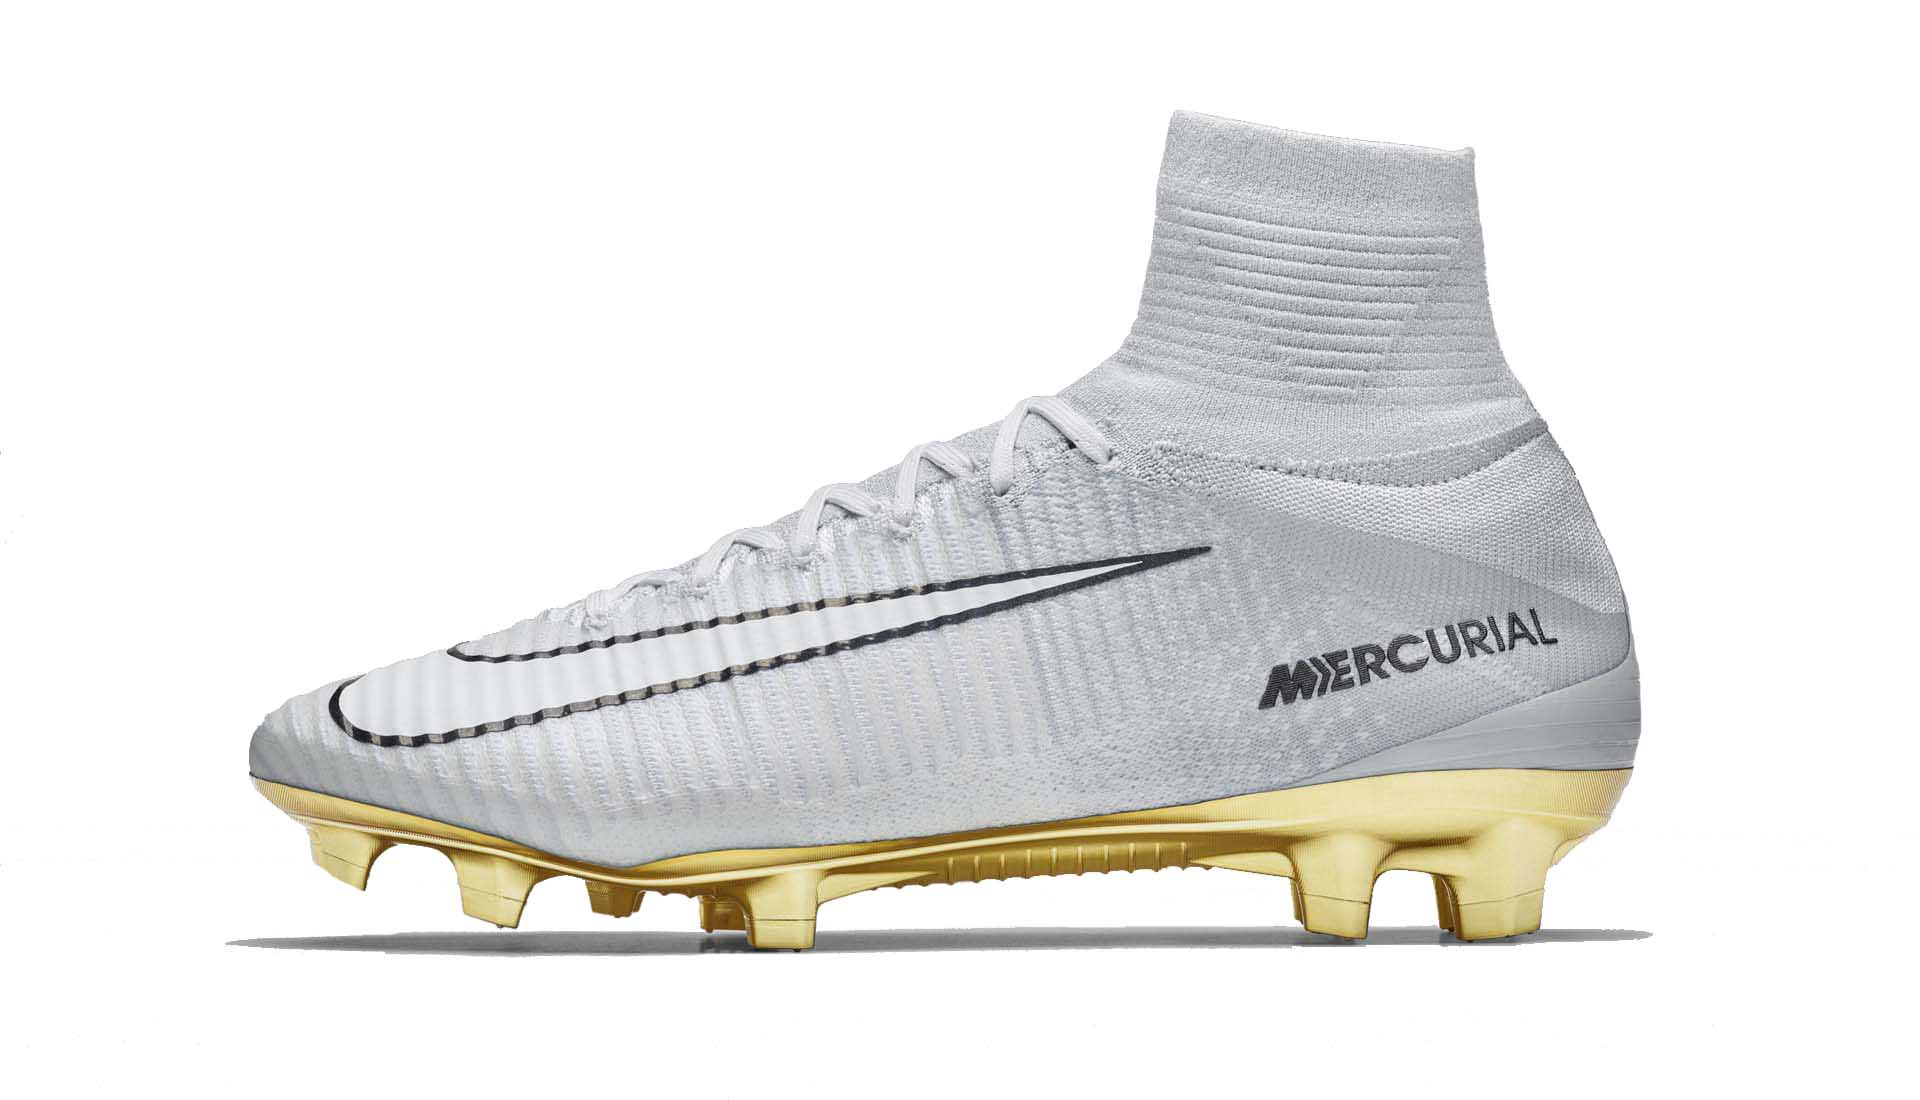 Nike Mercurial Vapor XI cr7 FG ACC 852 514 001 us 7.5 10 12.5 .